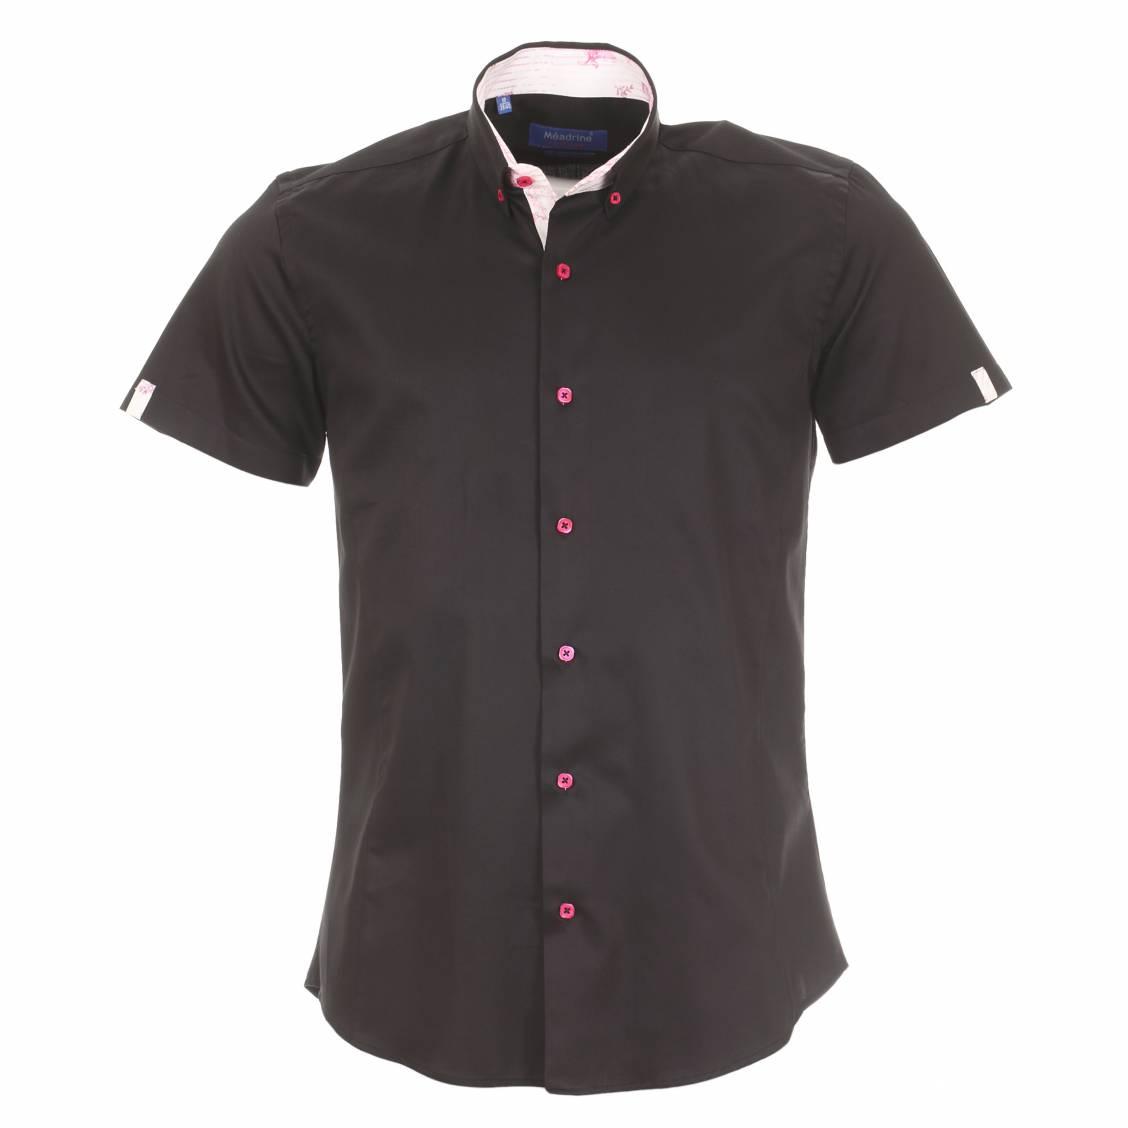 chemise homme manches courtes m adrine noire opposition rose p le fleurie rue des hommes. Black Bedroom Furniture Sets. Home Design Ideas